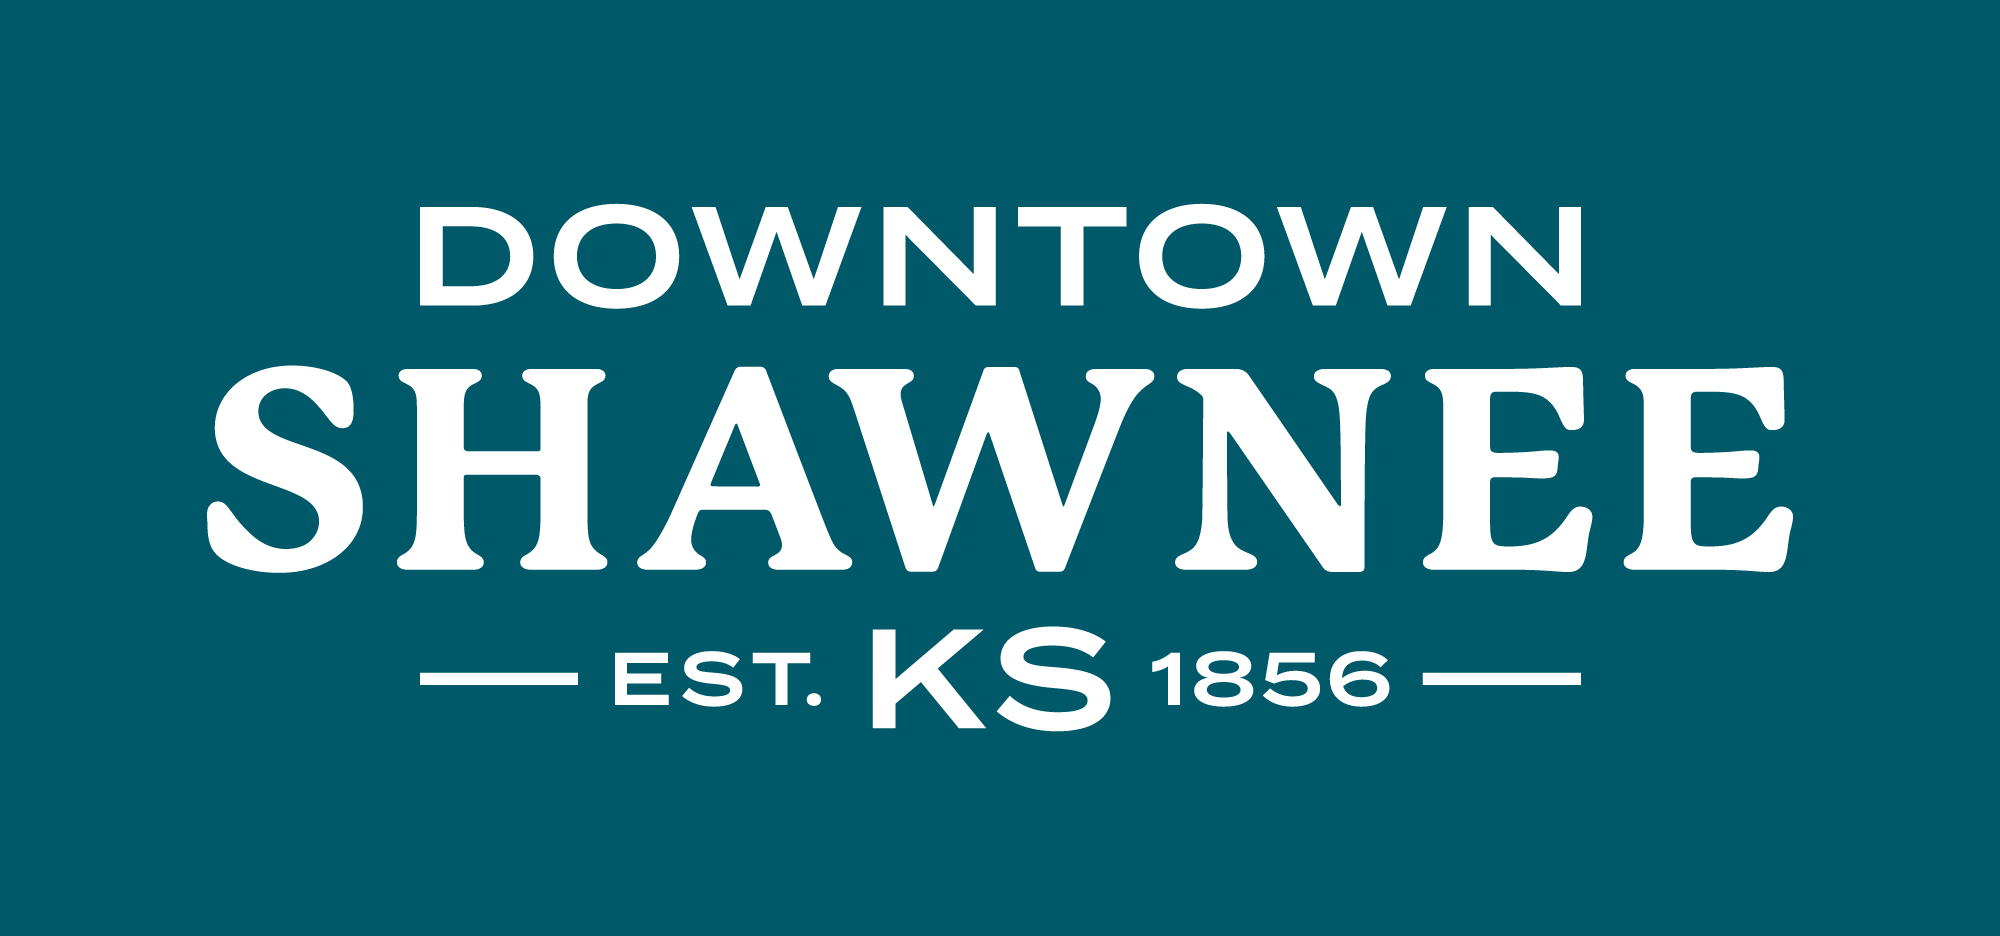 Downtown_Shawnee_Reverse-Dark Teal_RGB